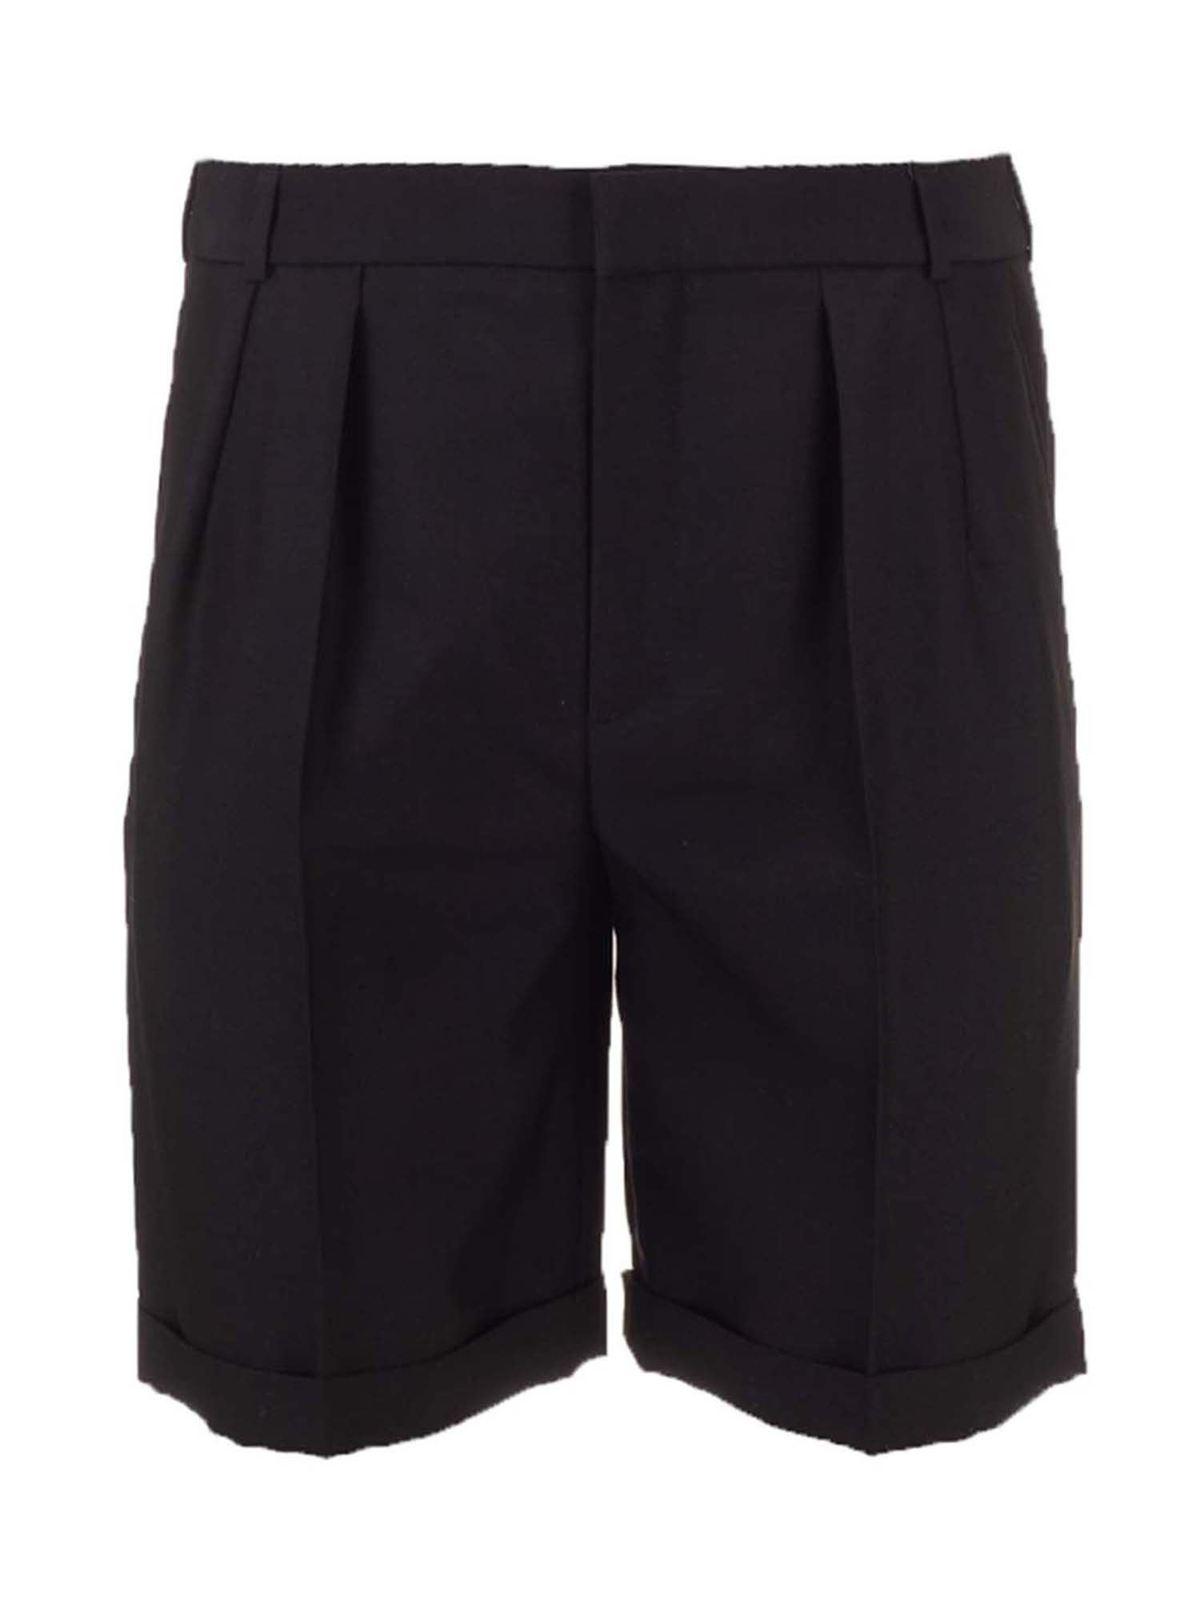 Saint Laurent Shorts TAILORED BERMUDA SHORTS IN BLACK